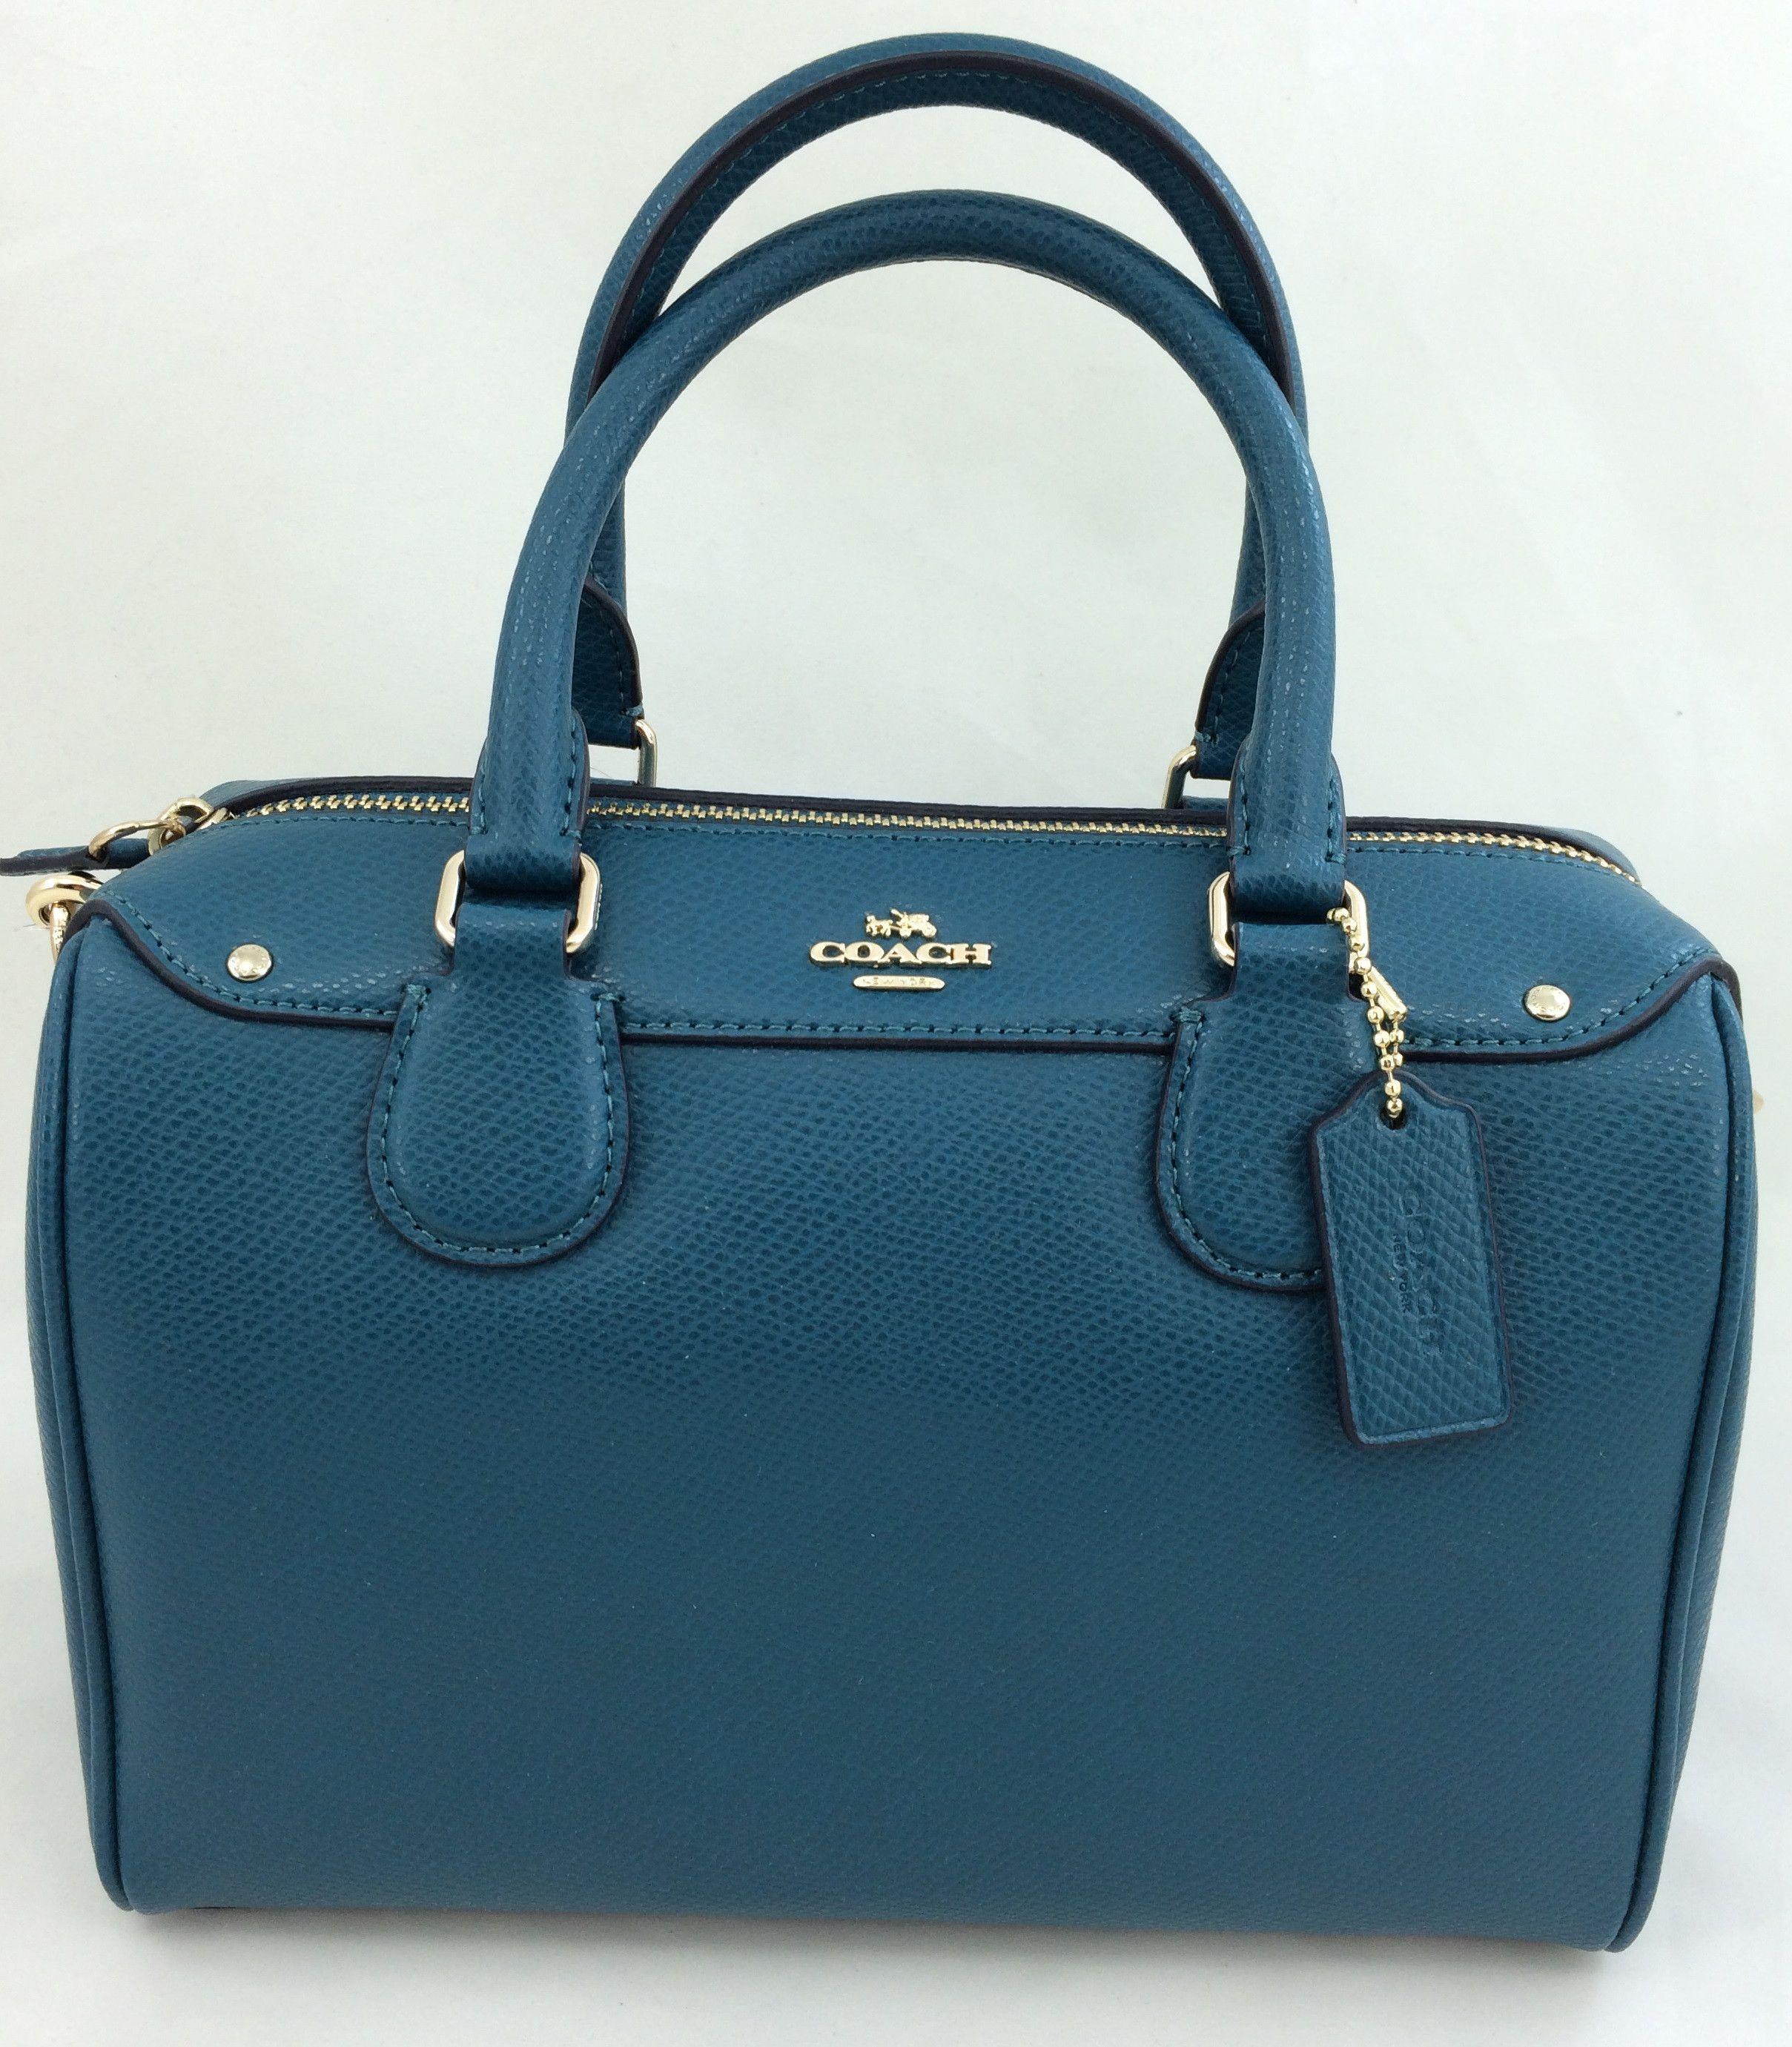 3b638d5fe5f New Authentic Coach F36624 Mini Bennett Satchel Shoulder Bag Crossgrain  leather in Atlantic Blue